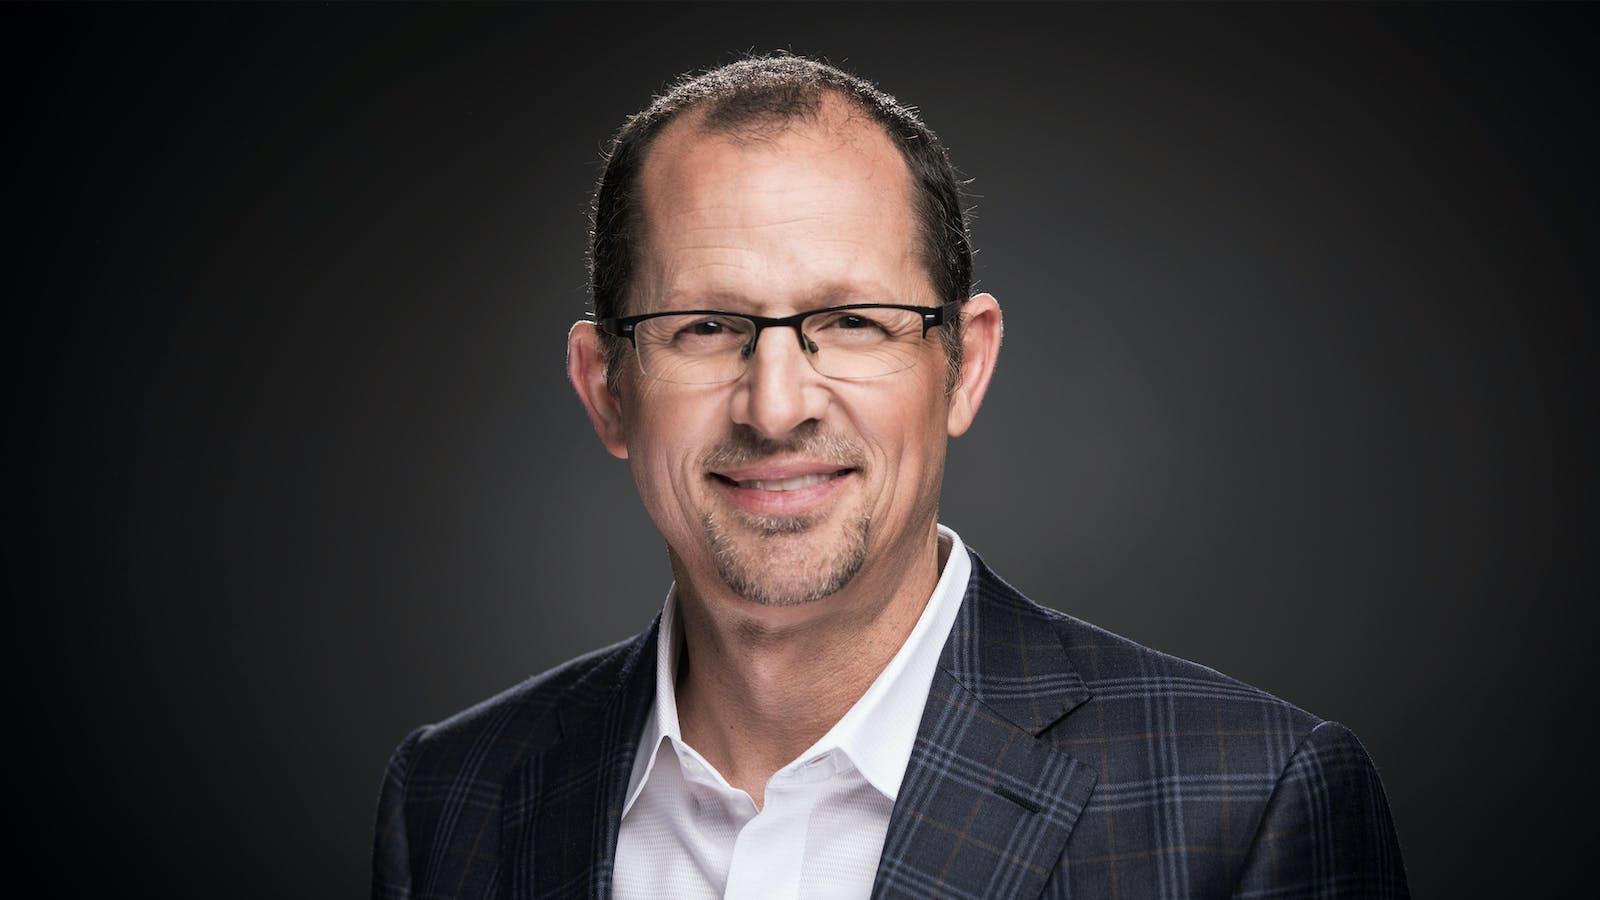 Coursera CEO Jeff Maggioncalda. Photo by Coursera